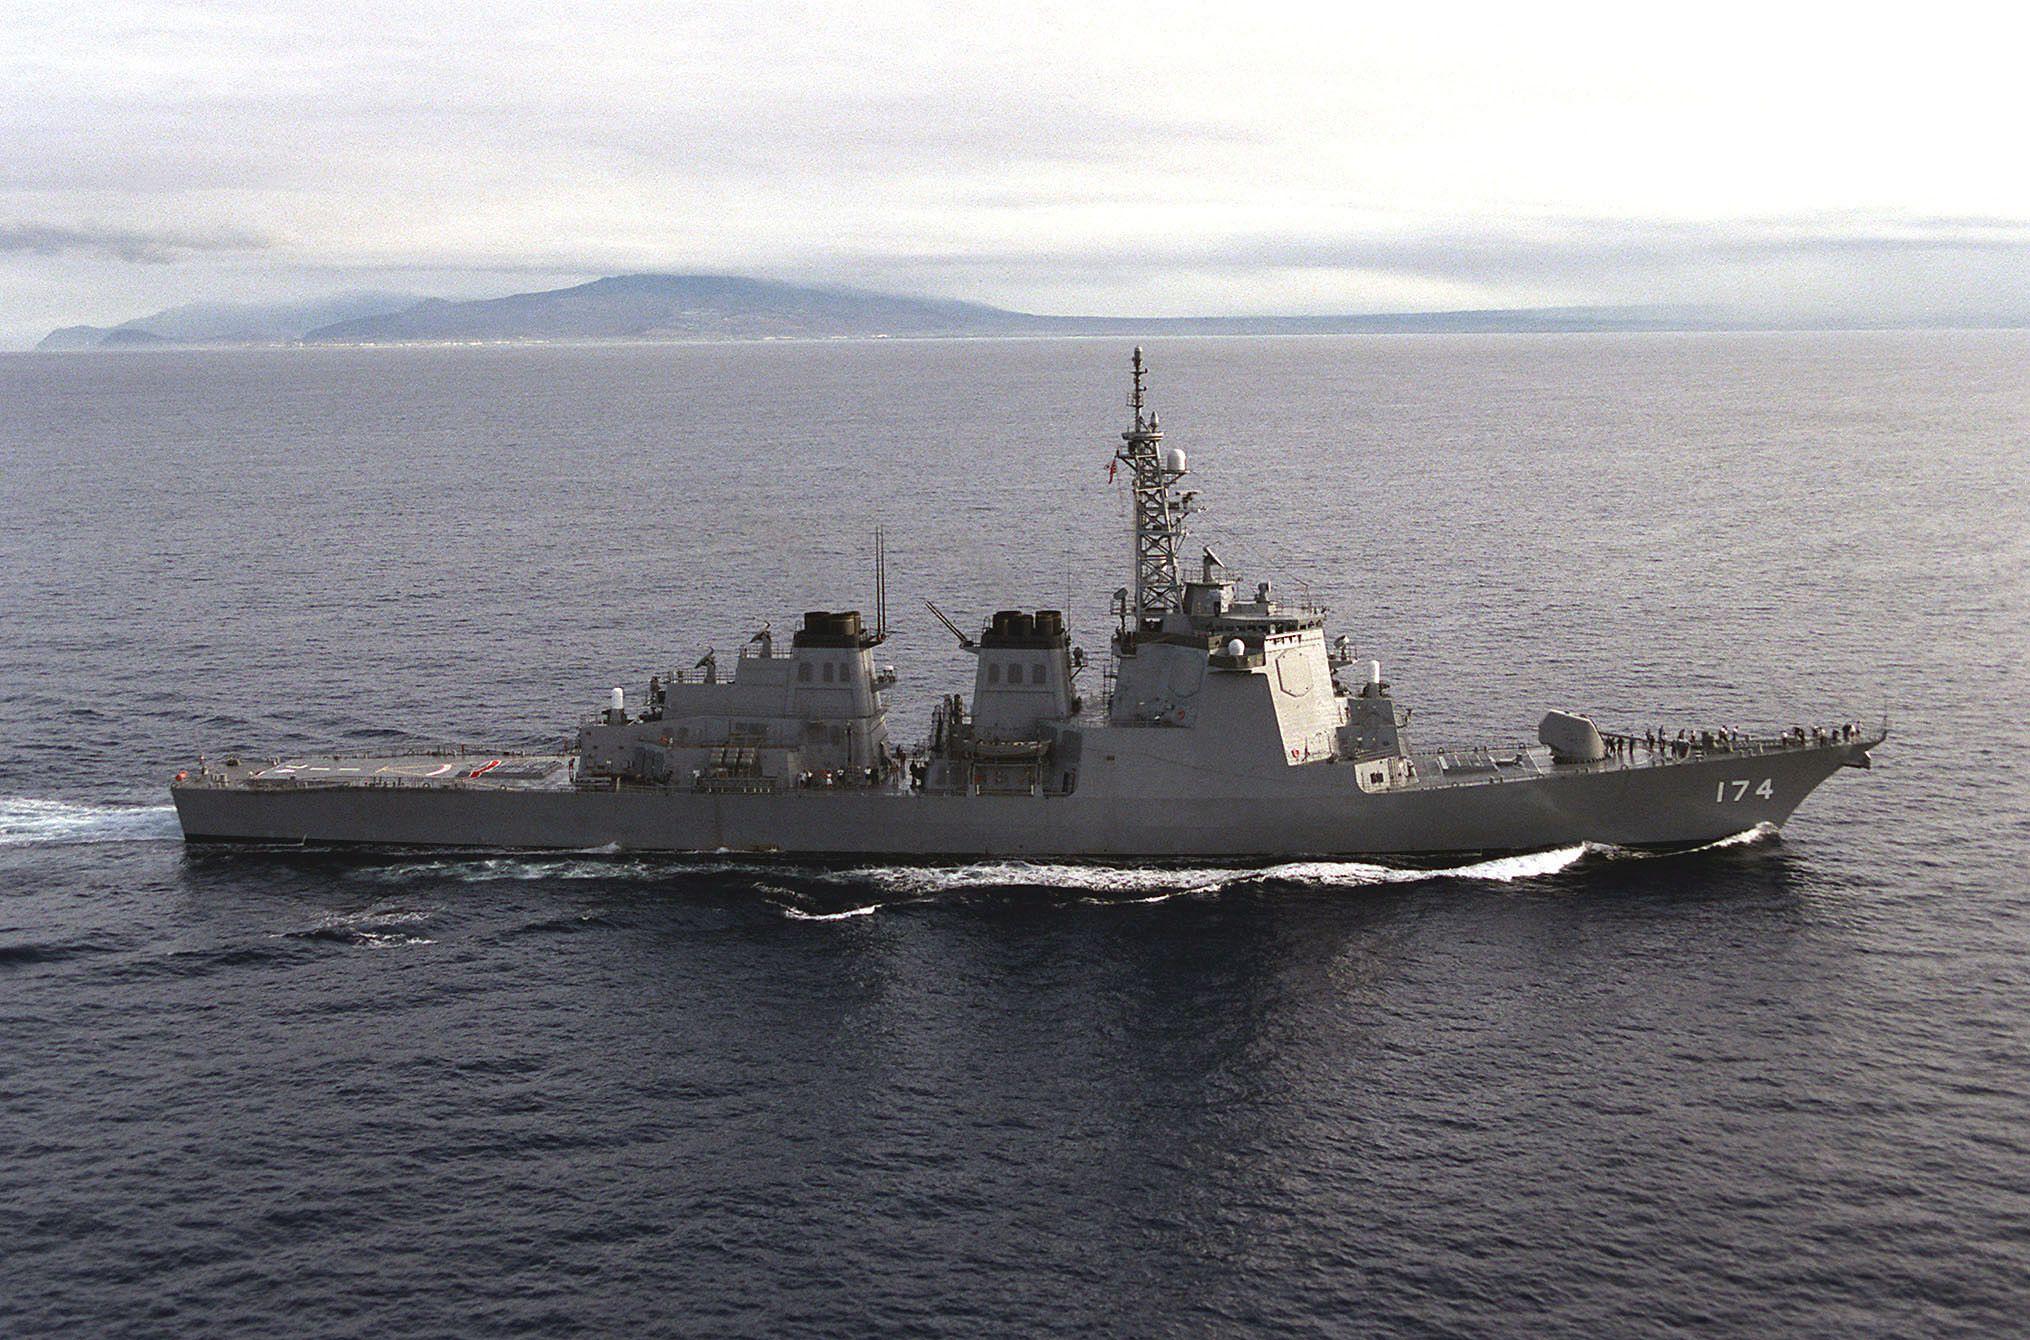 Explore Navy Coast Guard, Navy Ships, And More!